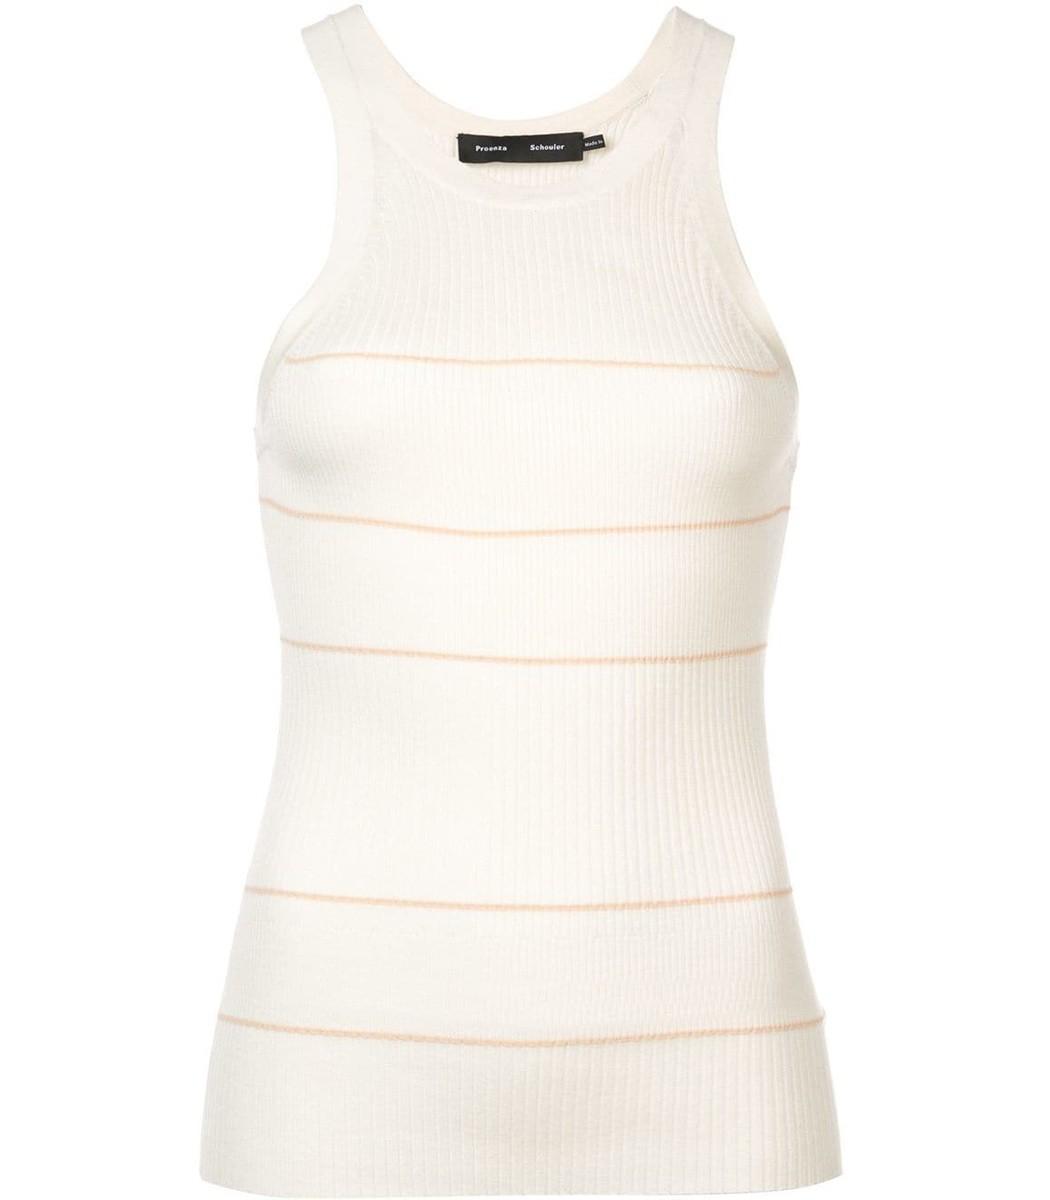 White Silk Cashmere Stripped Tank Top